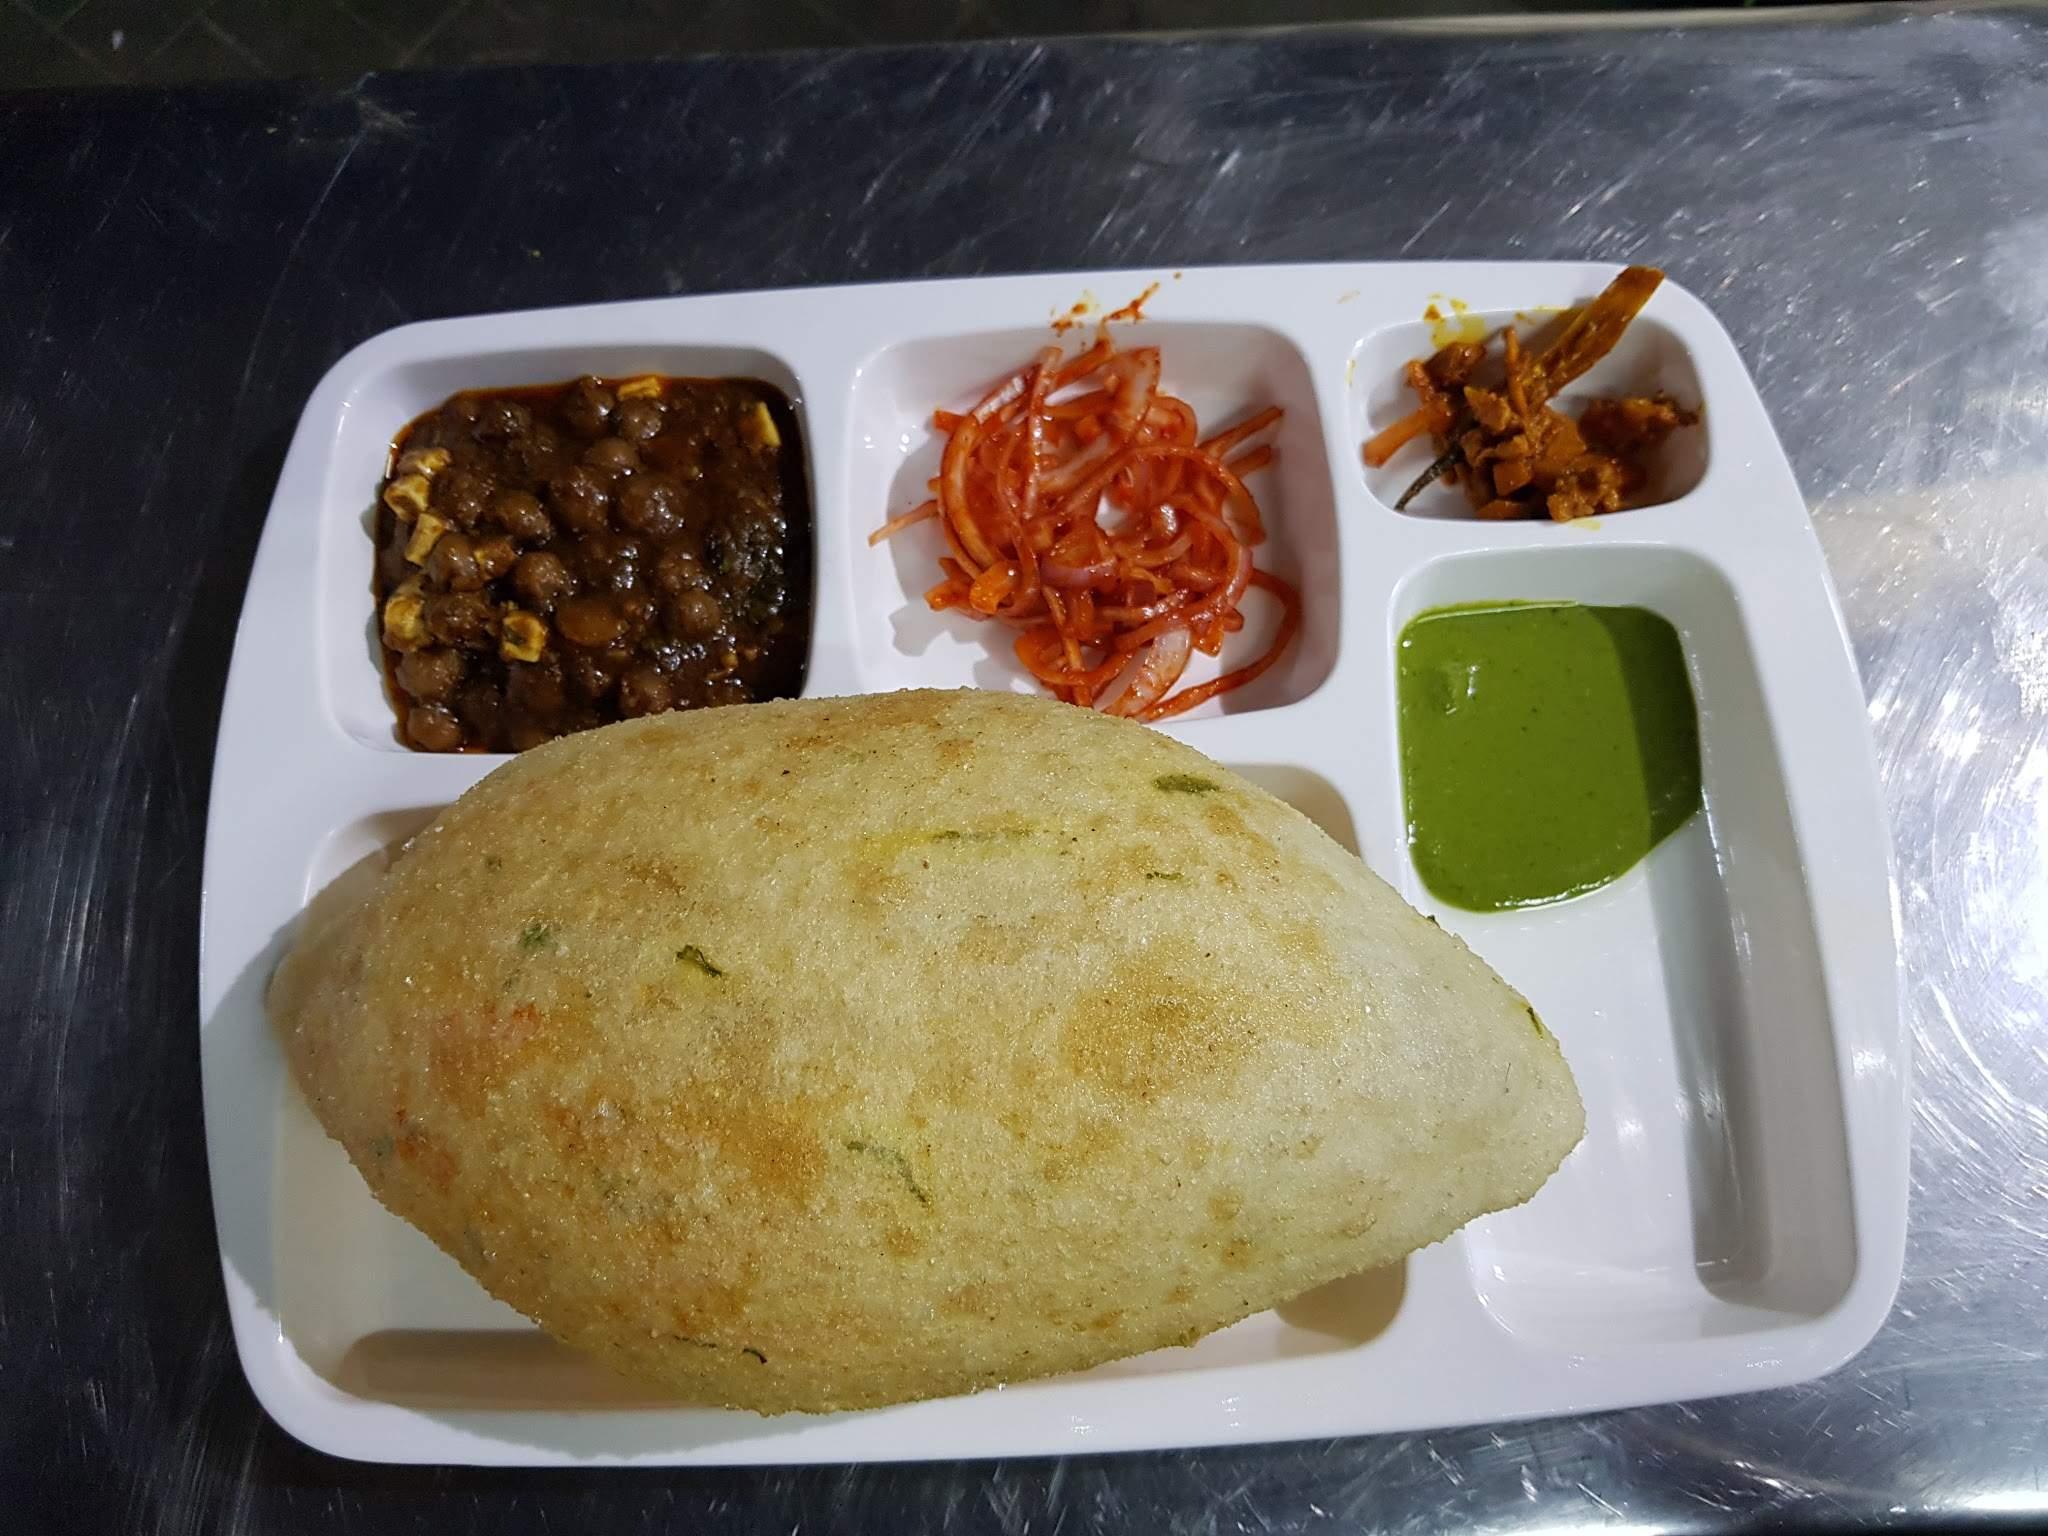 Pic credit: Eat Kochi Eat